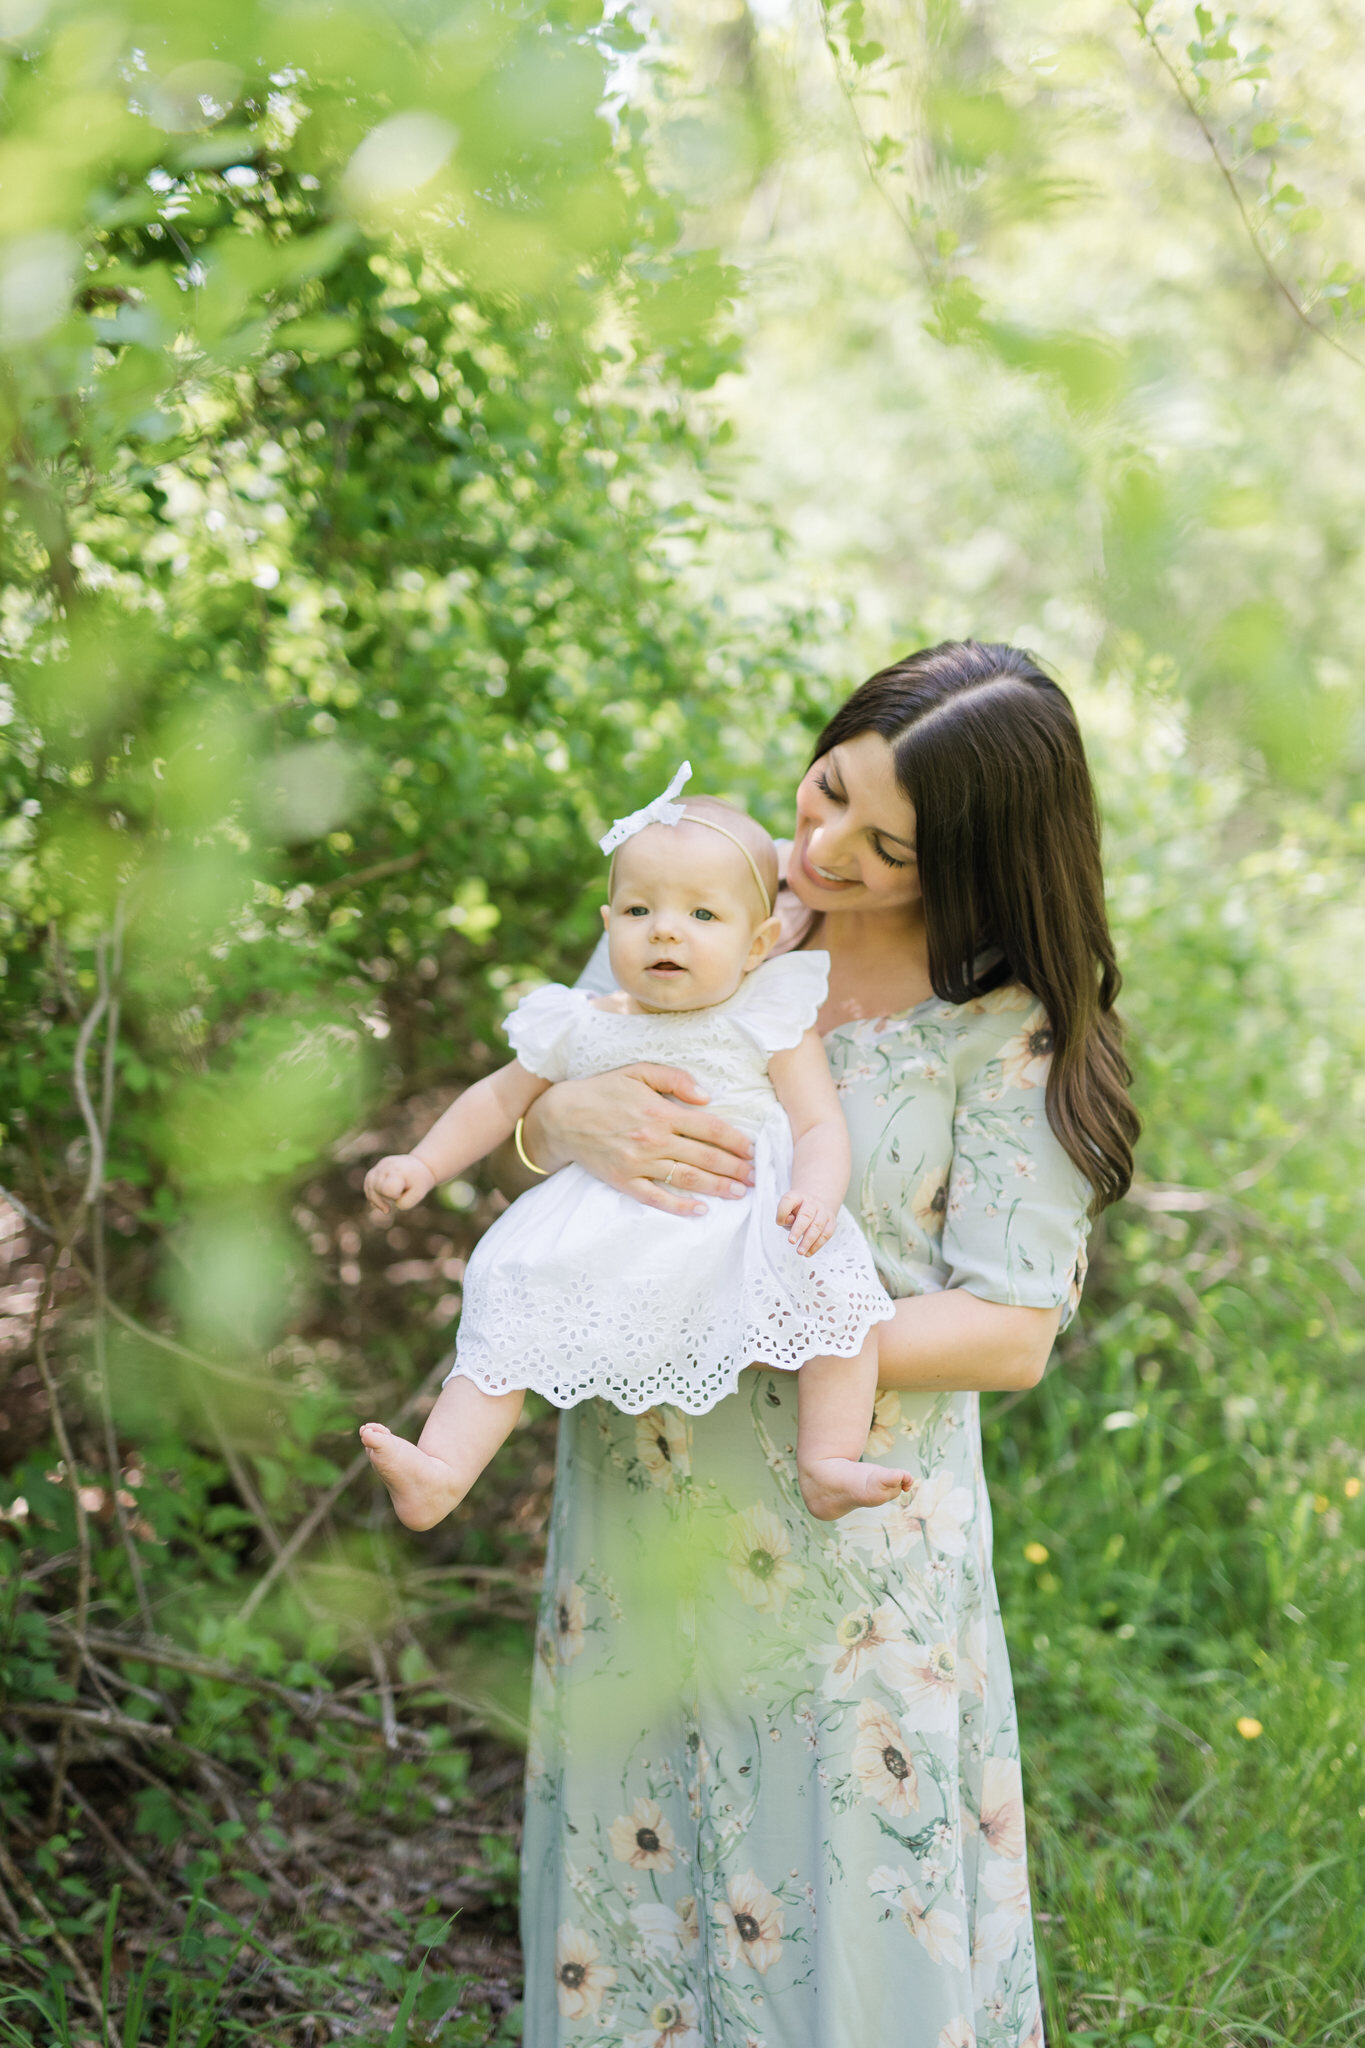 ct motherhood session_motherhood story CT_motherhood photographcer CT_2.jpg